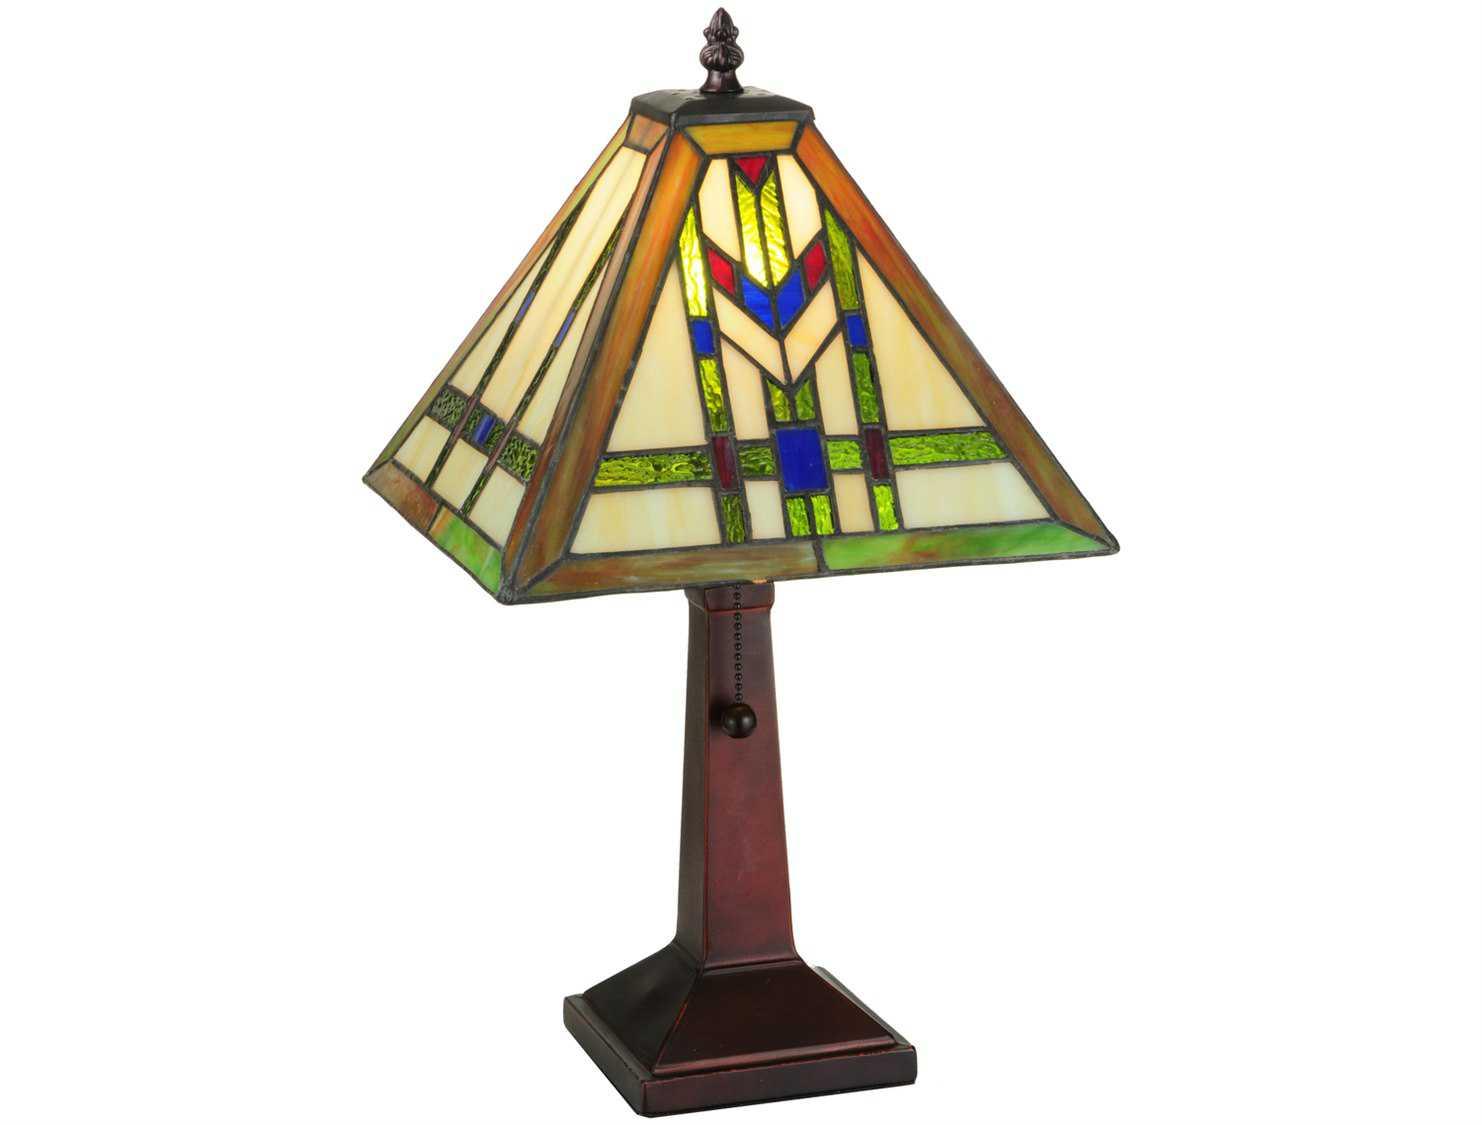 Meyda Tiffany Prairie Wheat Multi Color Table Lamp 139973